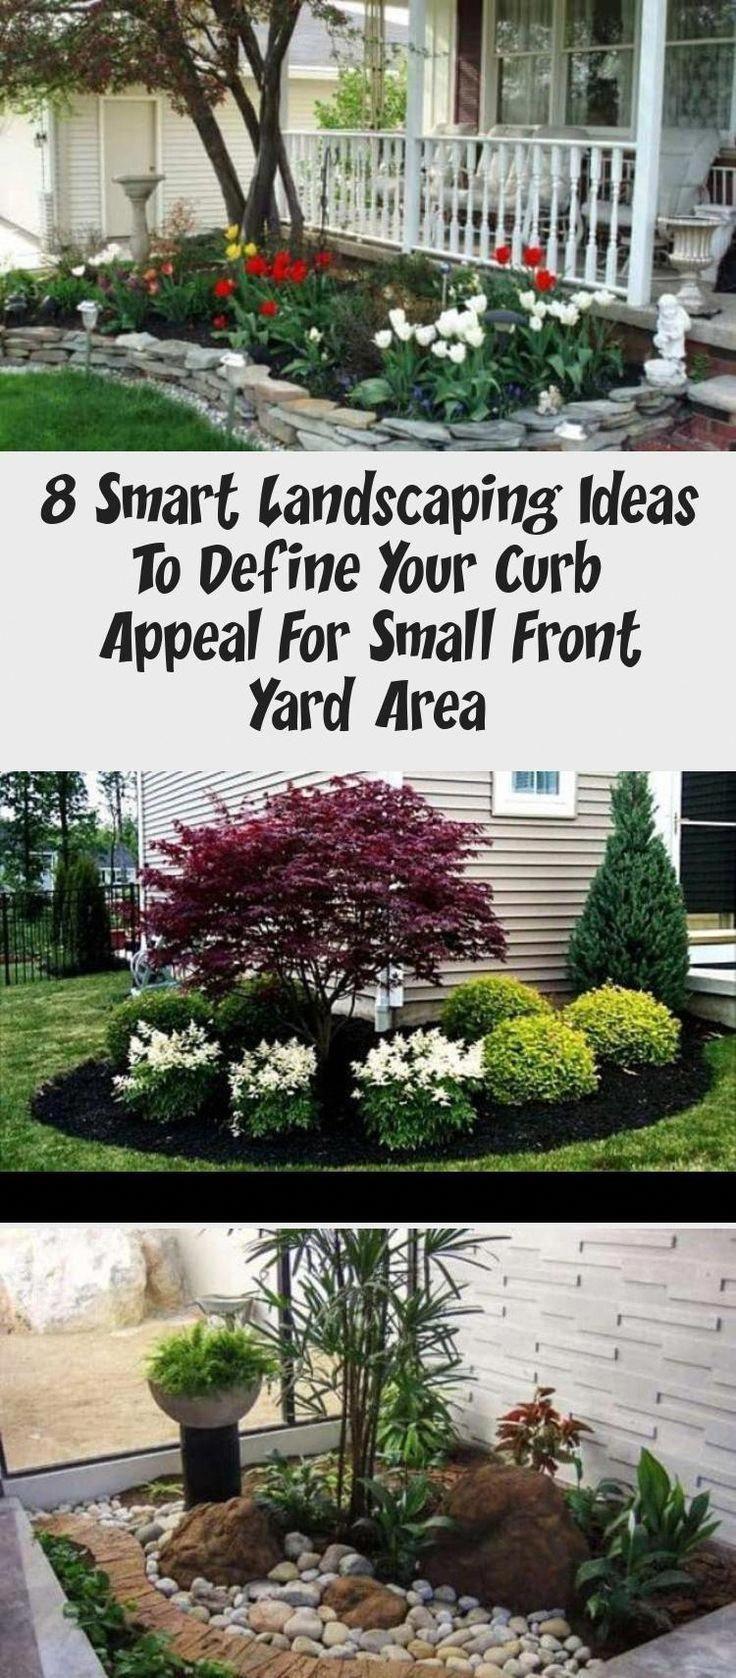 Good Looking Landscape Tree Watercolor Landscapetreewatercolor Landscaping Trees Landscape Small Front Yard